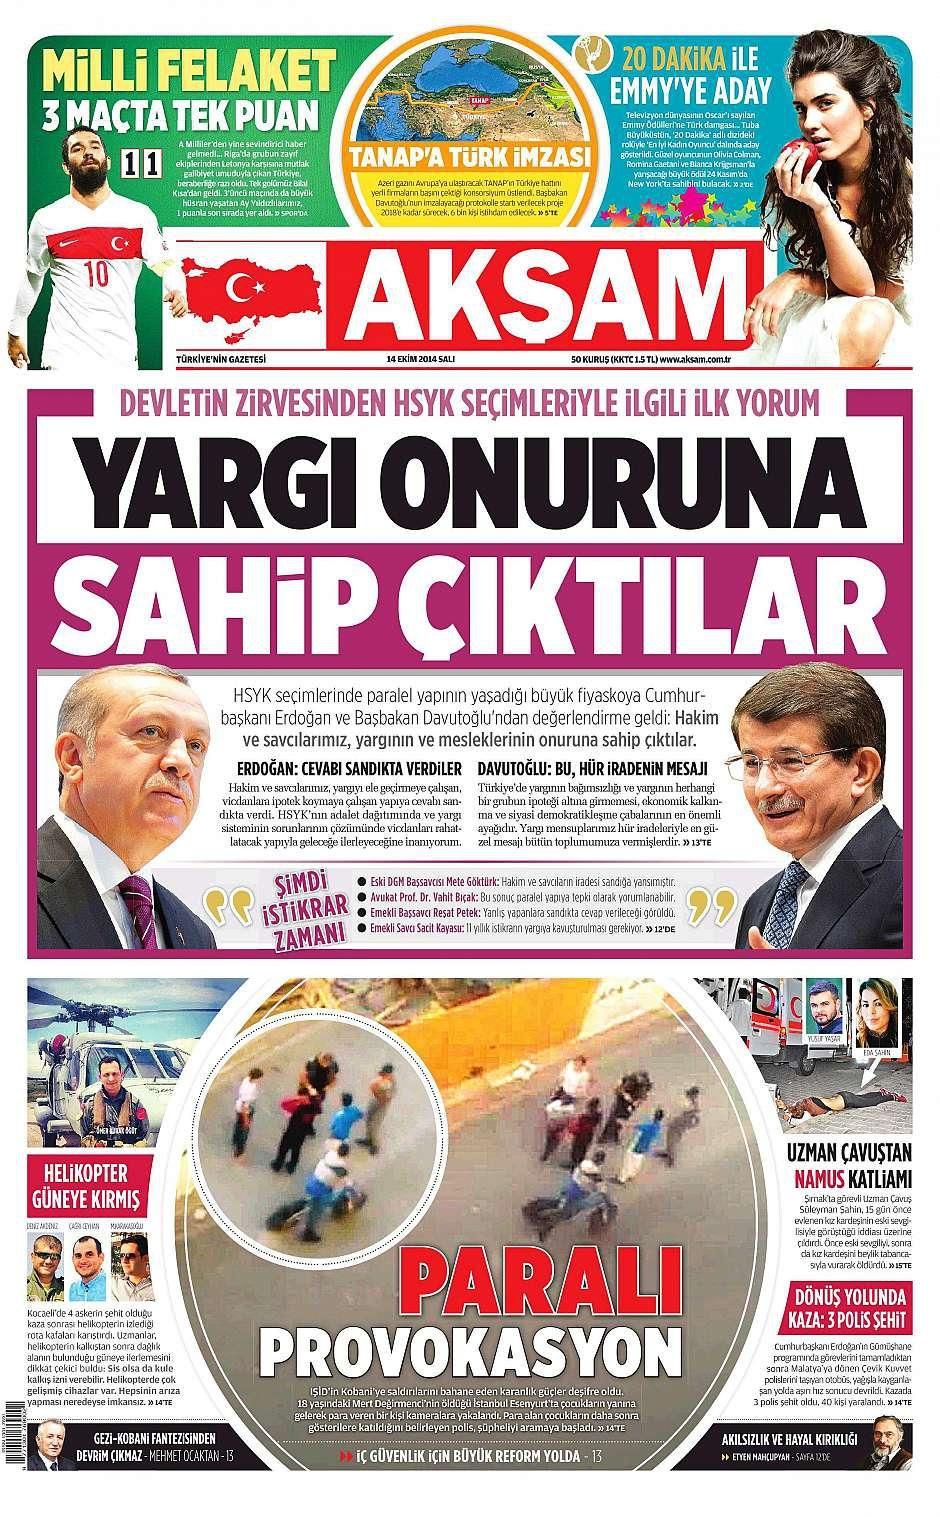 14 Ekim 2014 gazete manşetleri 10